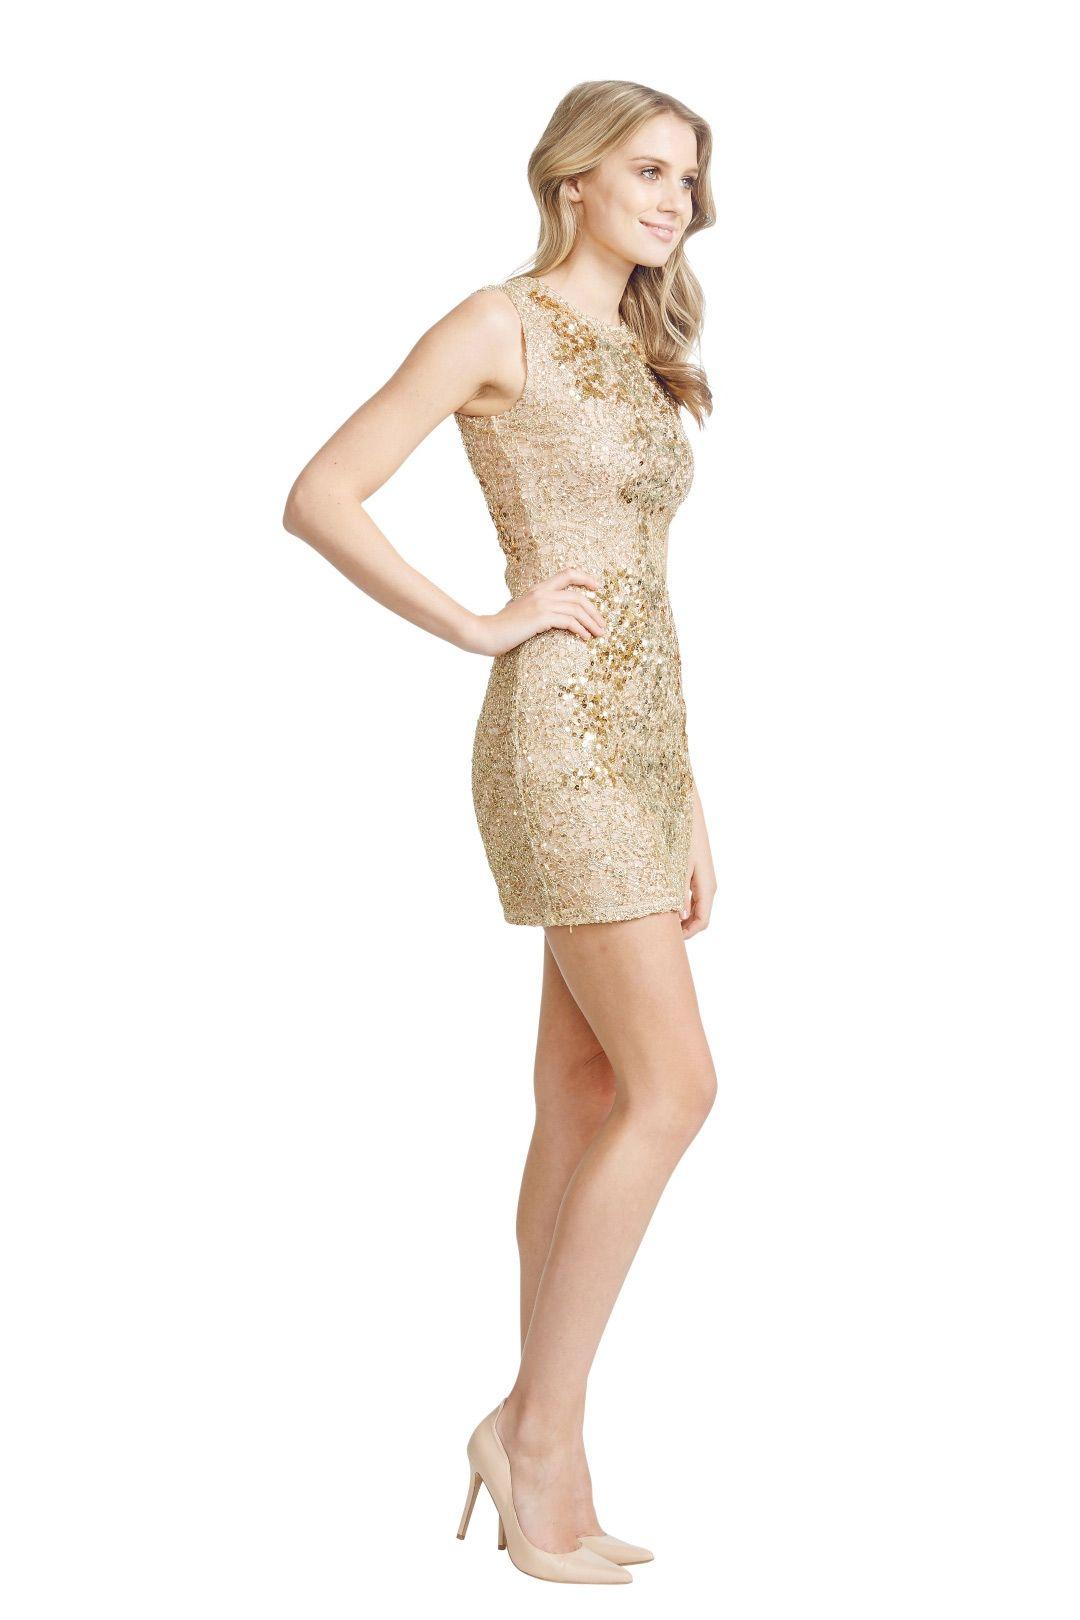 Alex Perry - Gilda Dress - Gold - Side